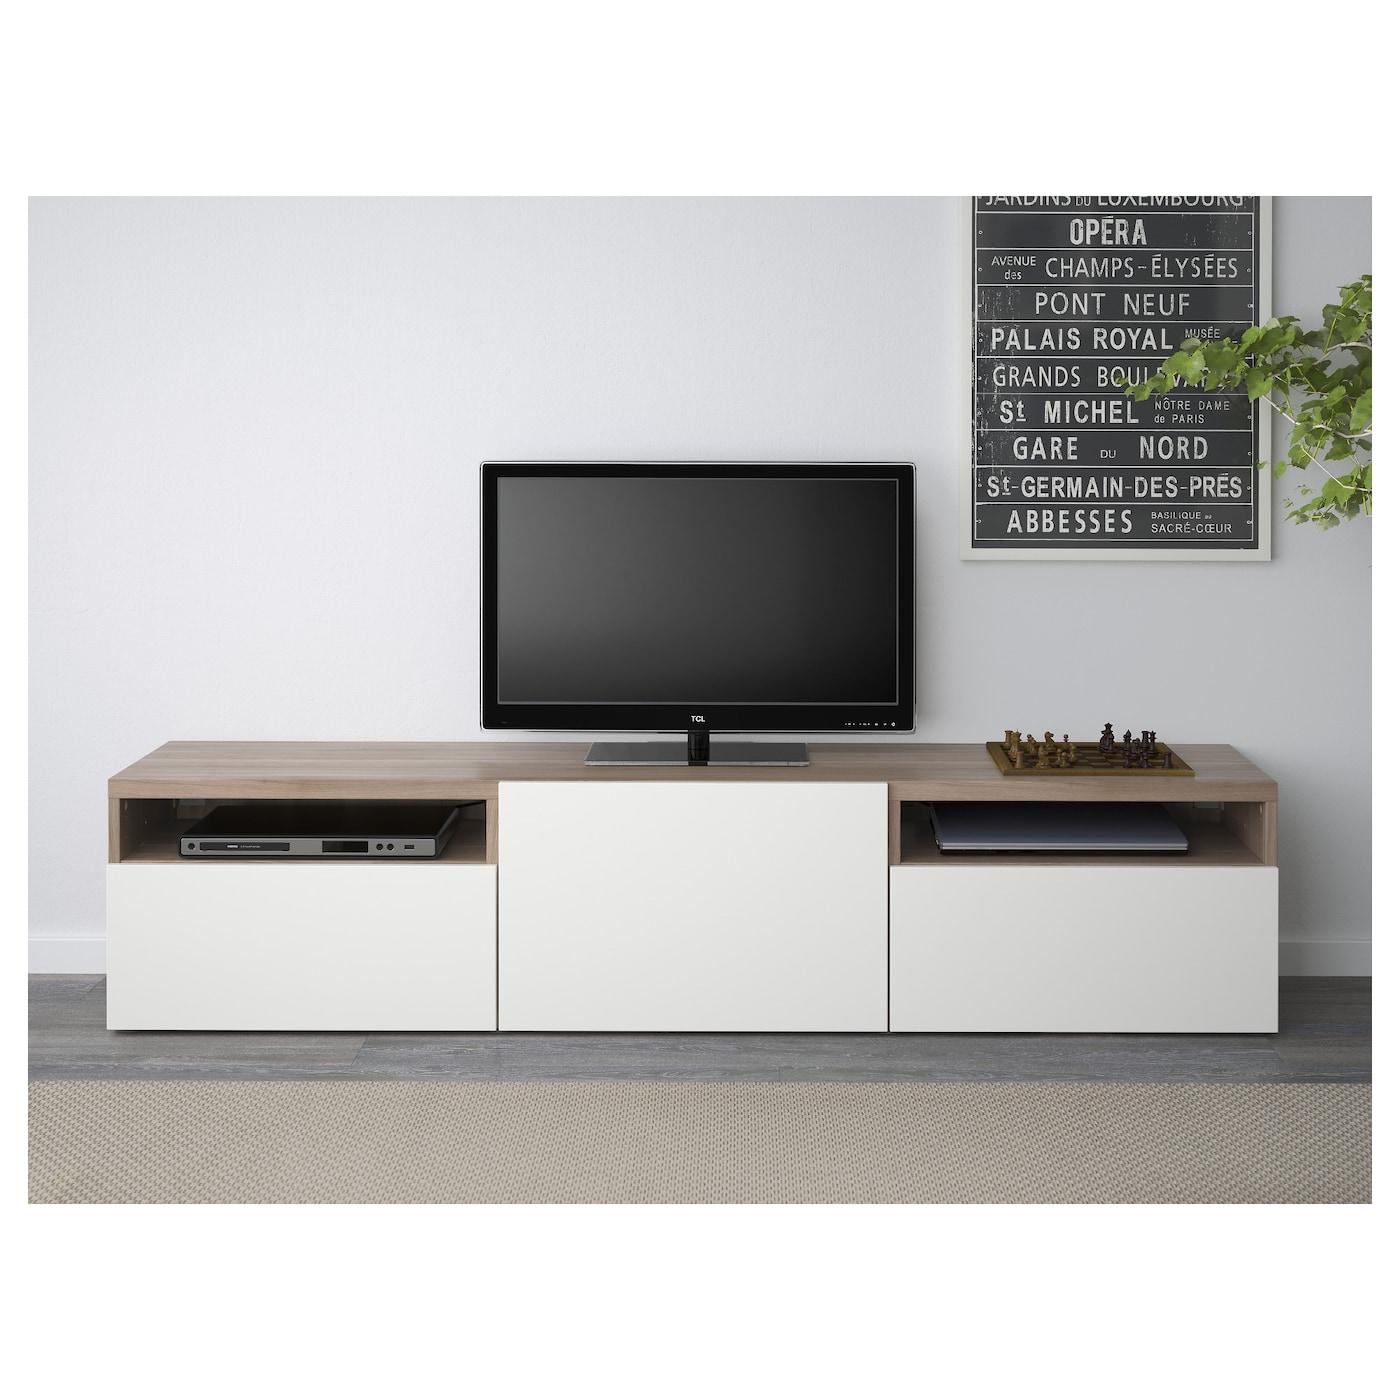 Banc Tv Ikea Besta Noyer Teinte Gris - Best Banc Tv Motif Noyer Teint Gris Lappviken Blanc 180x40x38 Cm [mjhdah]http://www.ikea.com/be/fr/images/products/best%C3%A5-combinaison-meuble-tv-motif-noyer-teint%C3%A9-gris-selsviken-brillant-blanc__0345072_pe536103_s5.jpg